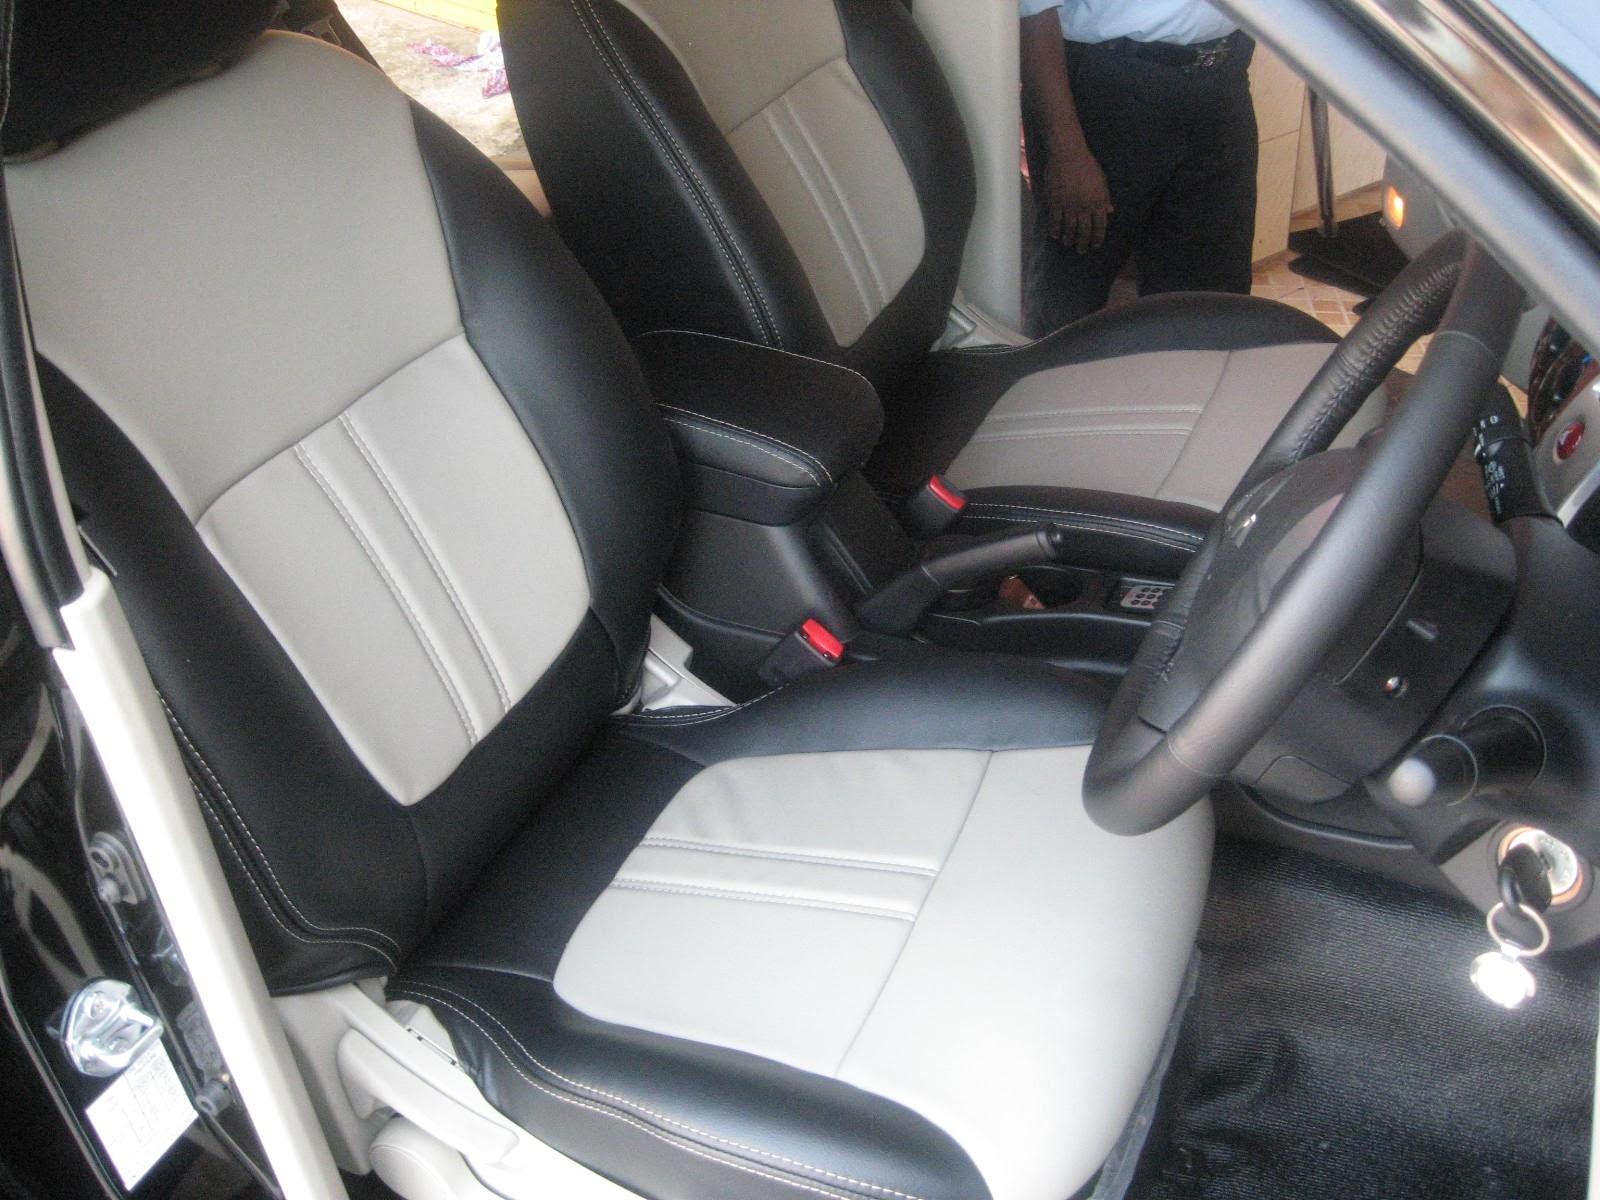 2013 Montero Sport Interior